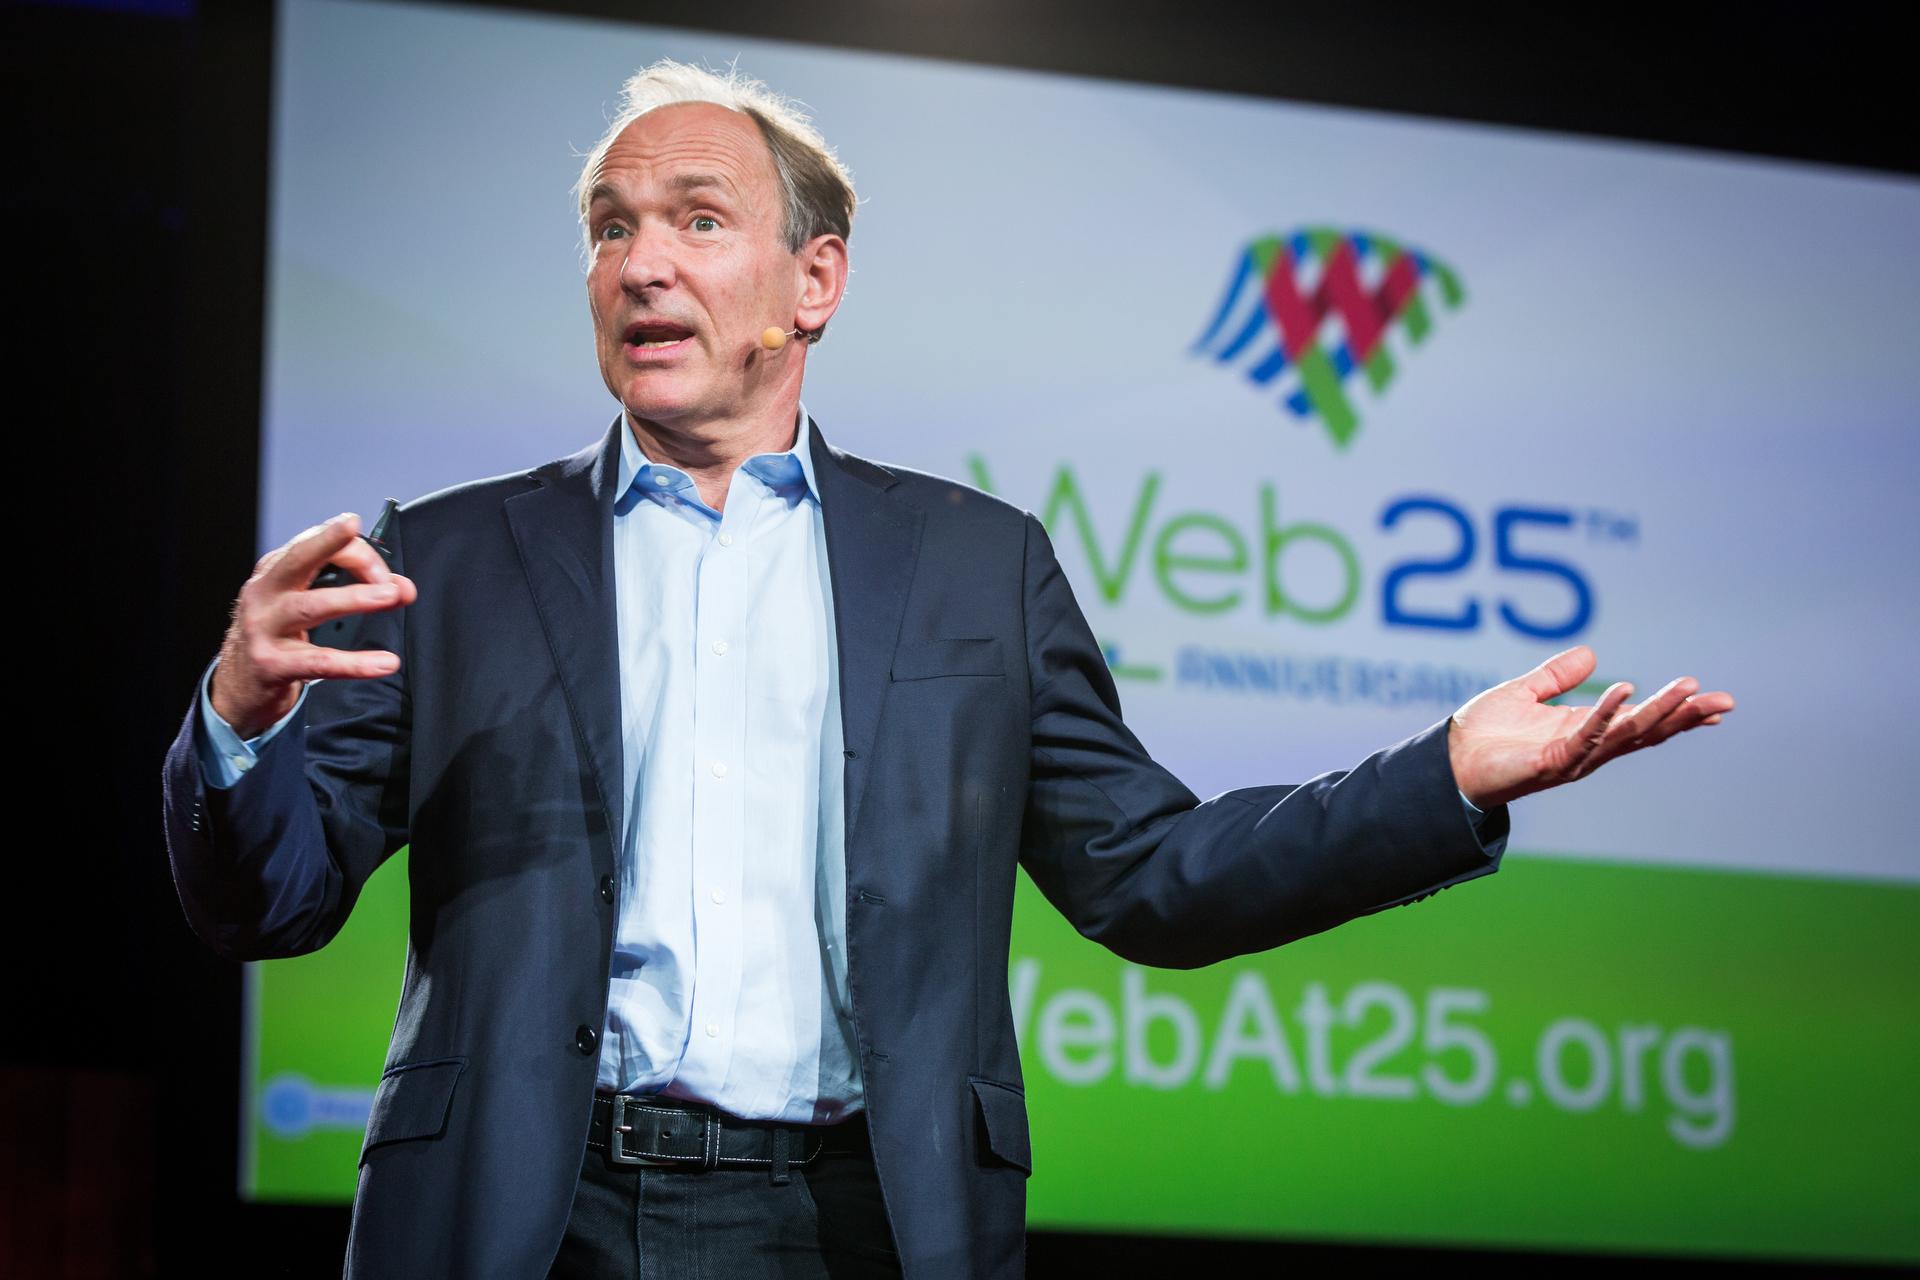 Sir Tim Berners-Lee. Photo: Bret Hartman